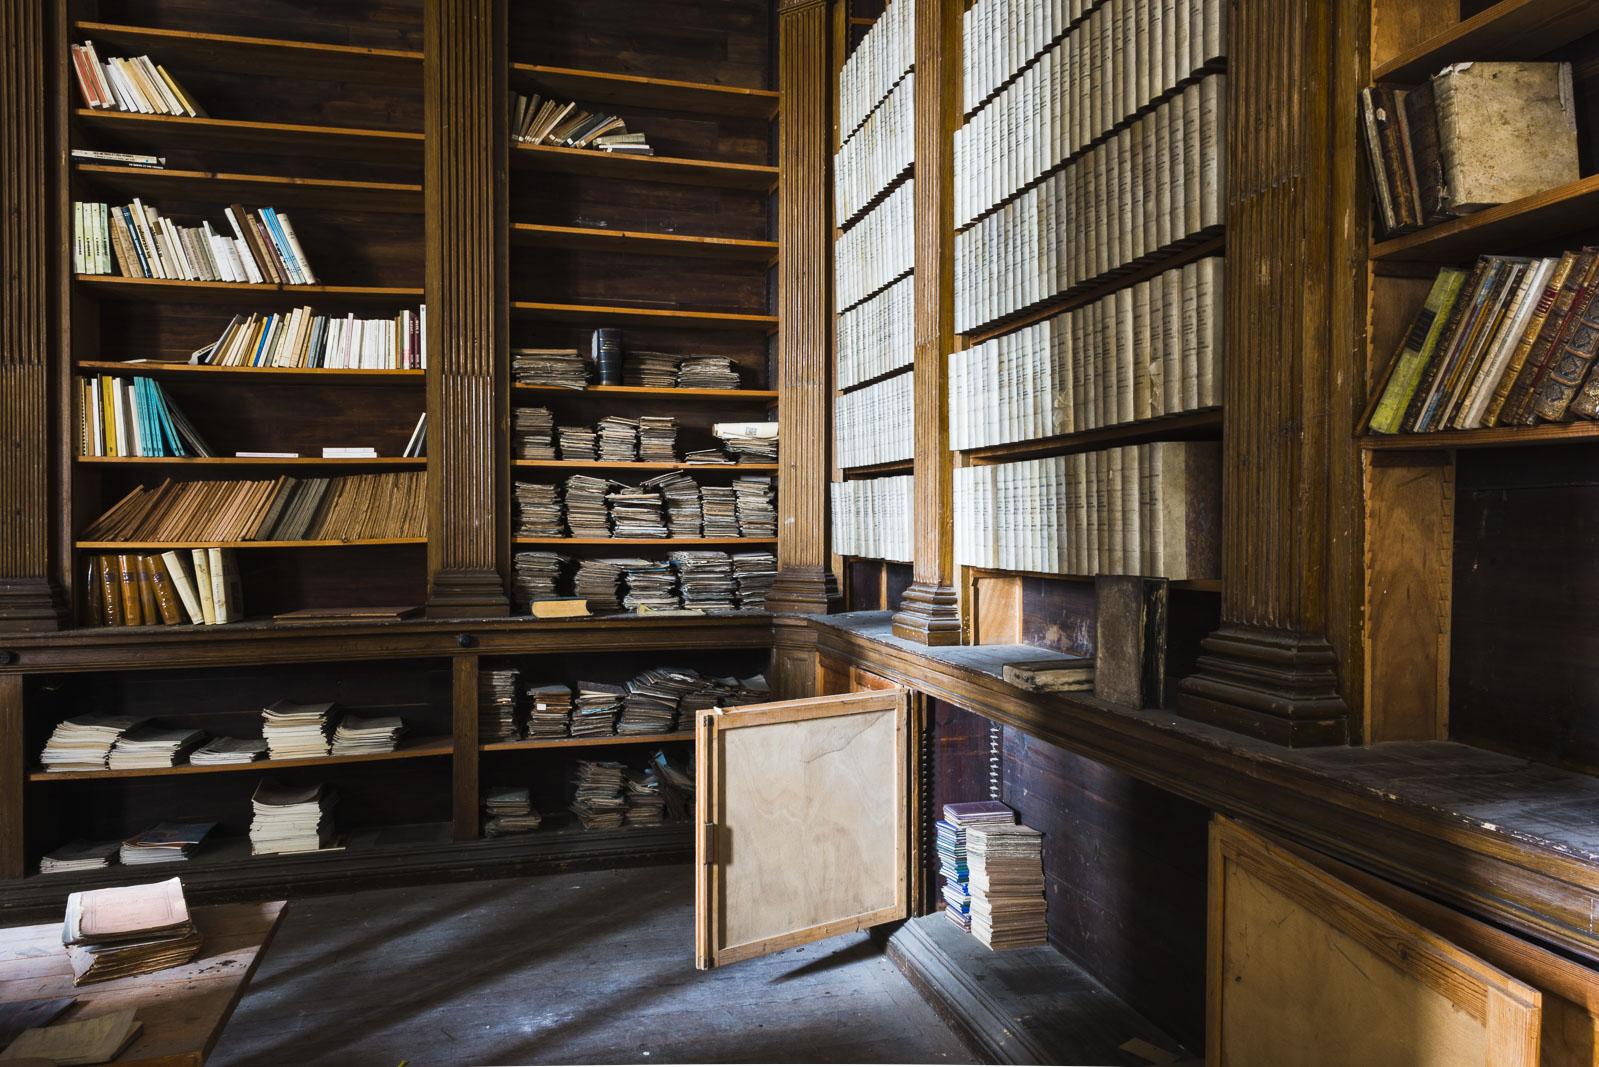 Abbaye de Saint-Riquier Library